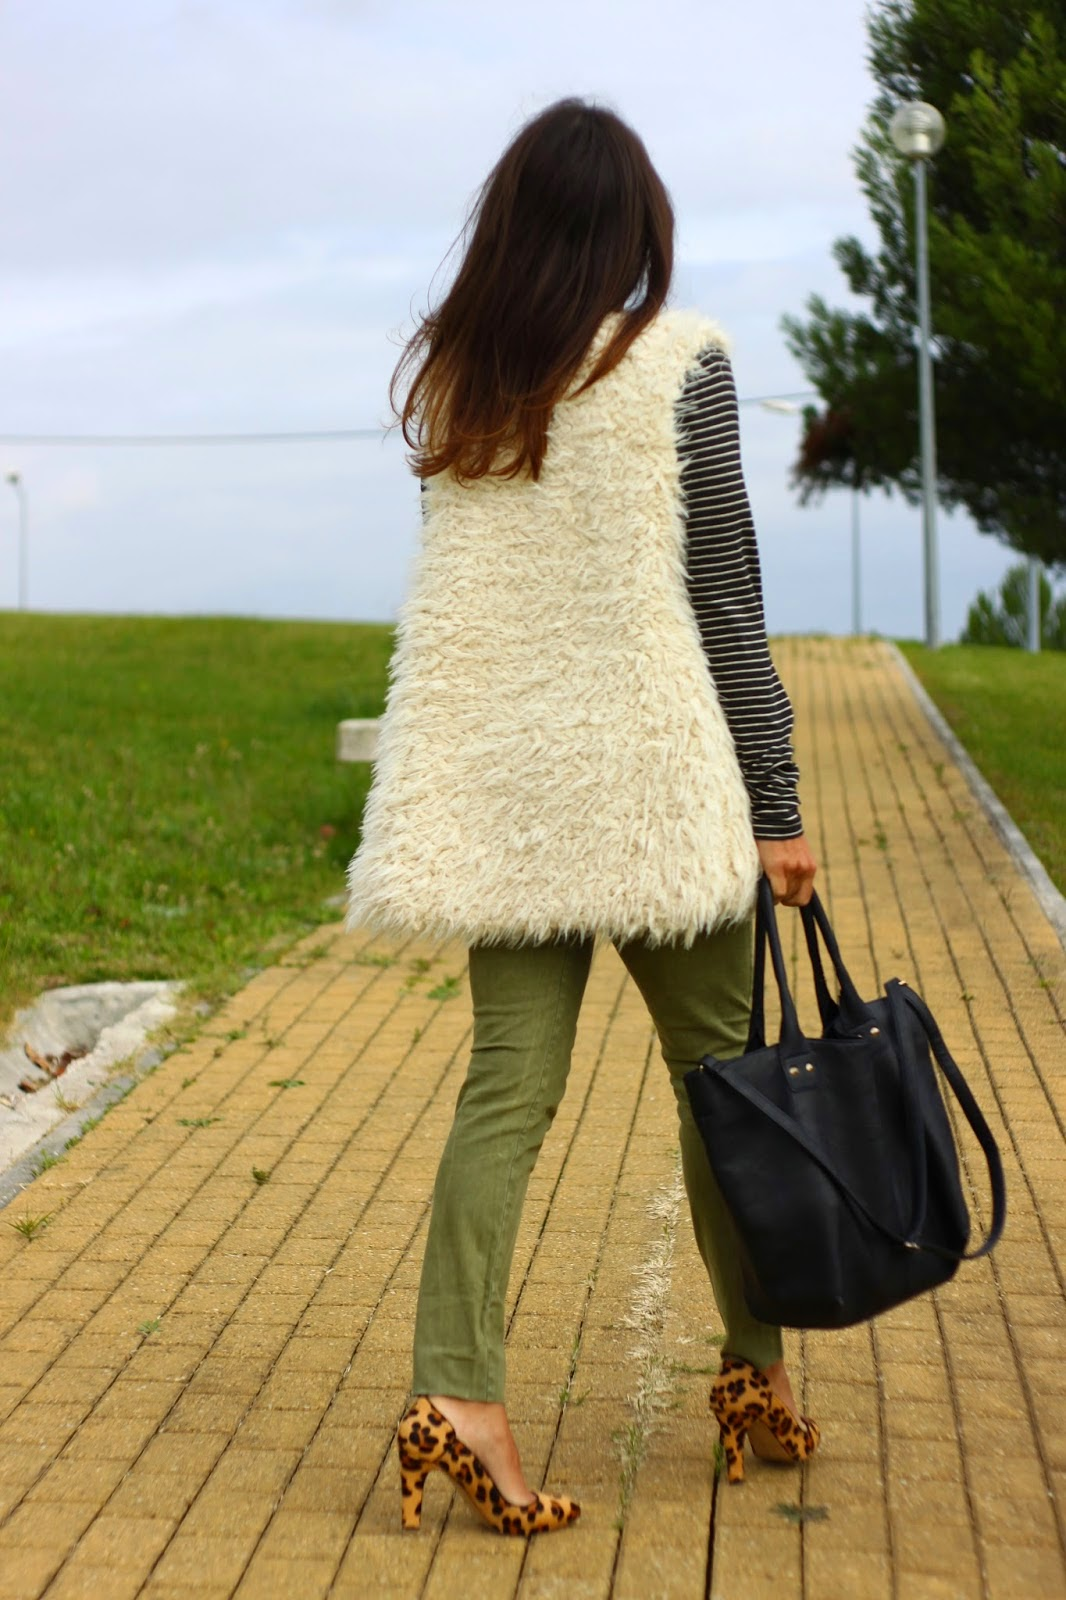 http://ilovefitametrica.blogspot.pt/2014/11/fur-vest.html#more